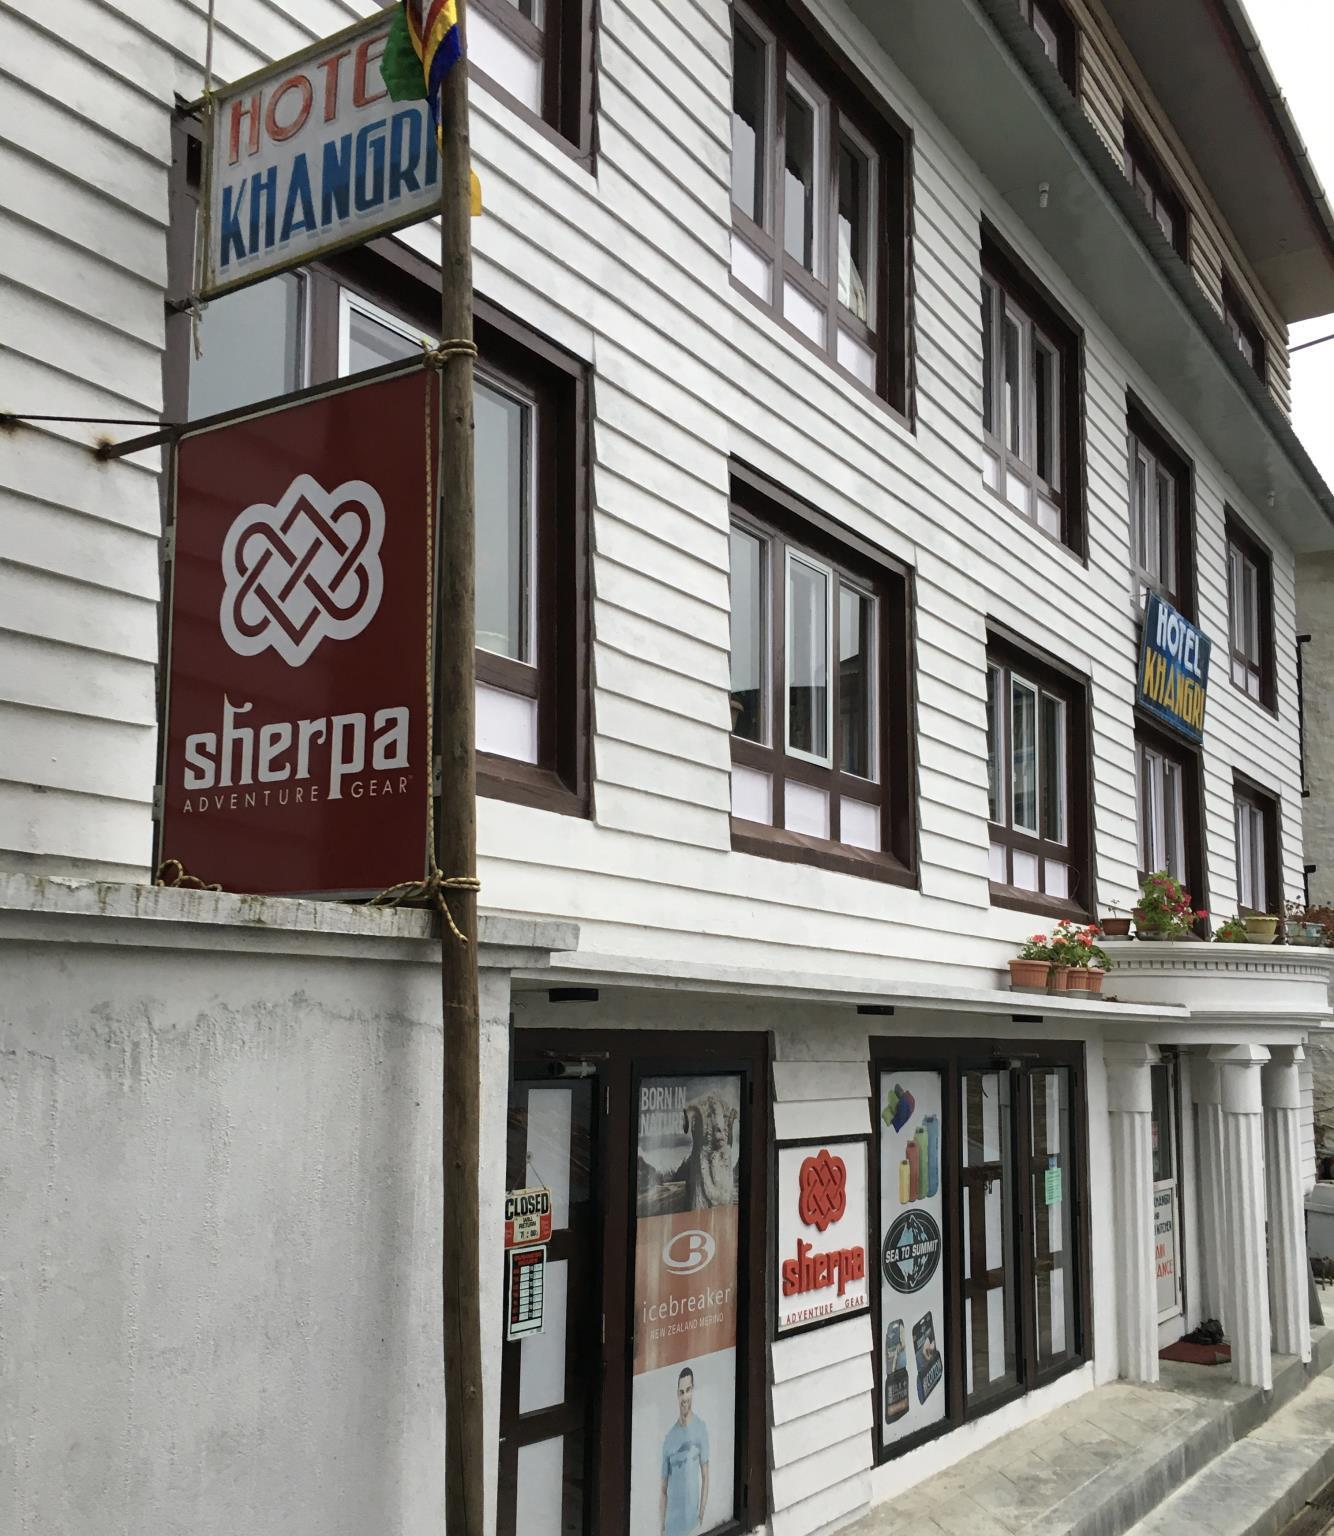 Hotel Khangri - Namche, Sagarmatha